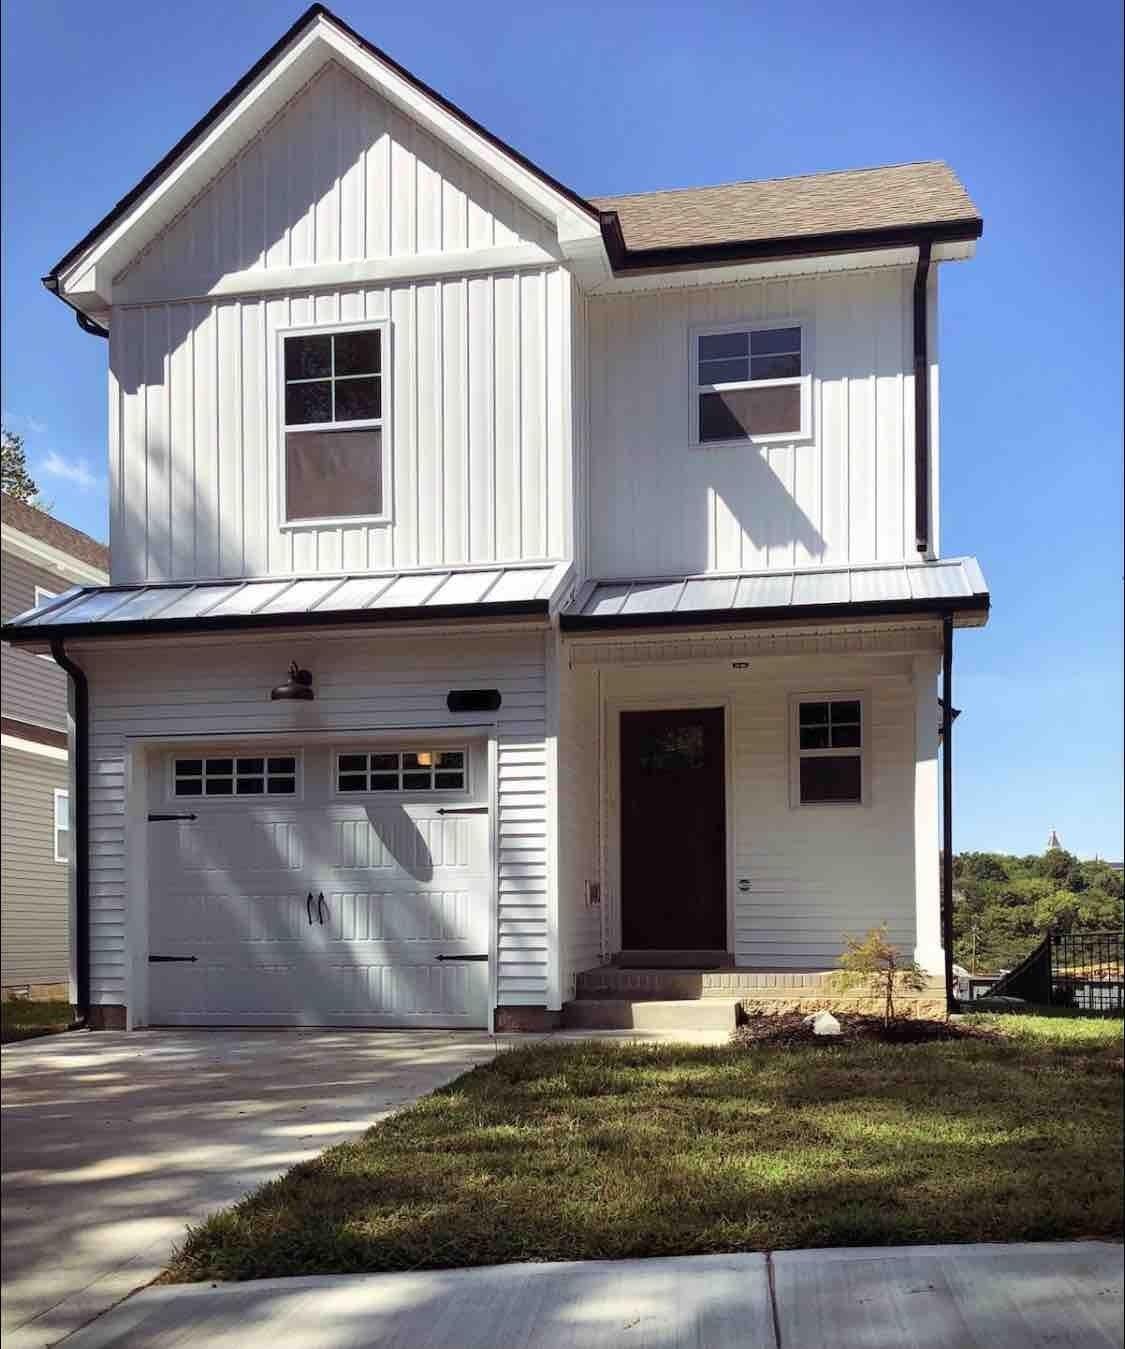 147 Blackman St, Clarksville, TN 37040 - MLS#: 2294764